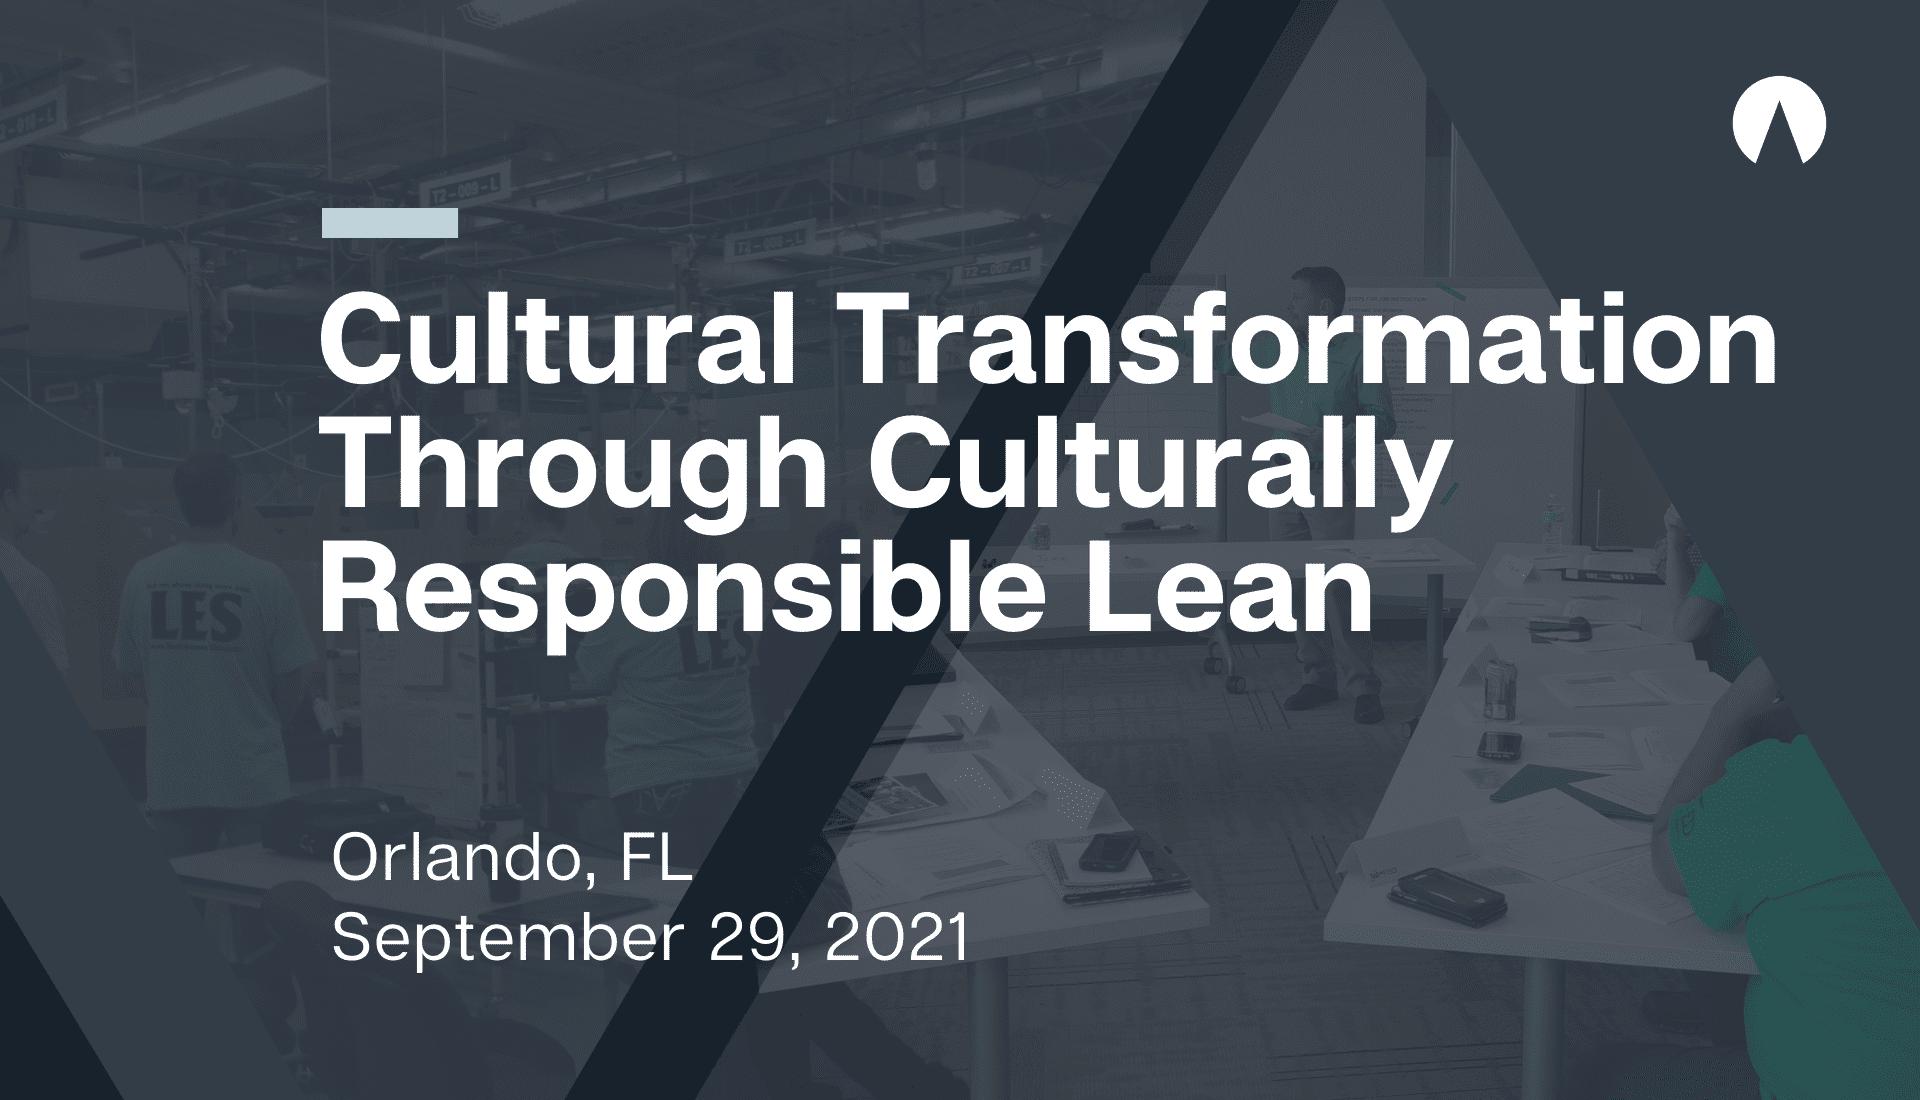 Cultural Transformation Through Culturally Responsible Lean